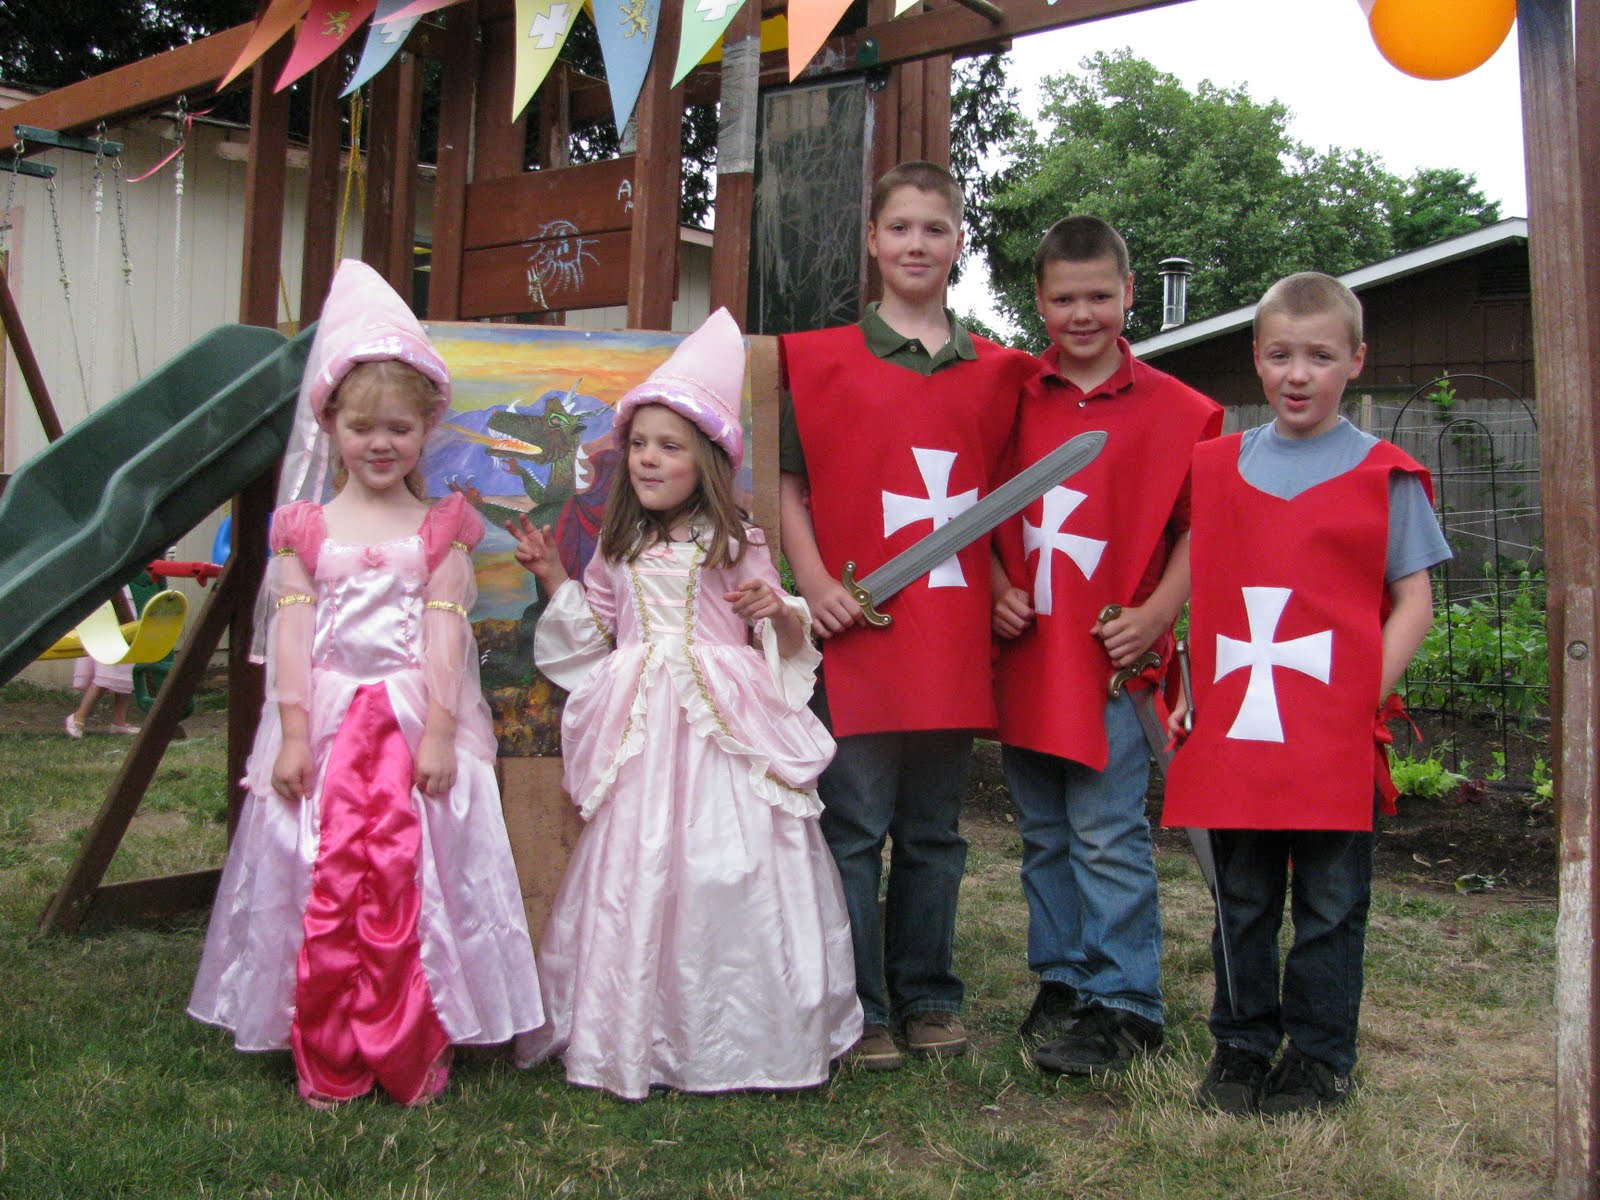 Proverbs 31 Woman: A Knight & Princess Party